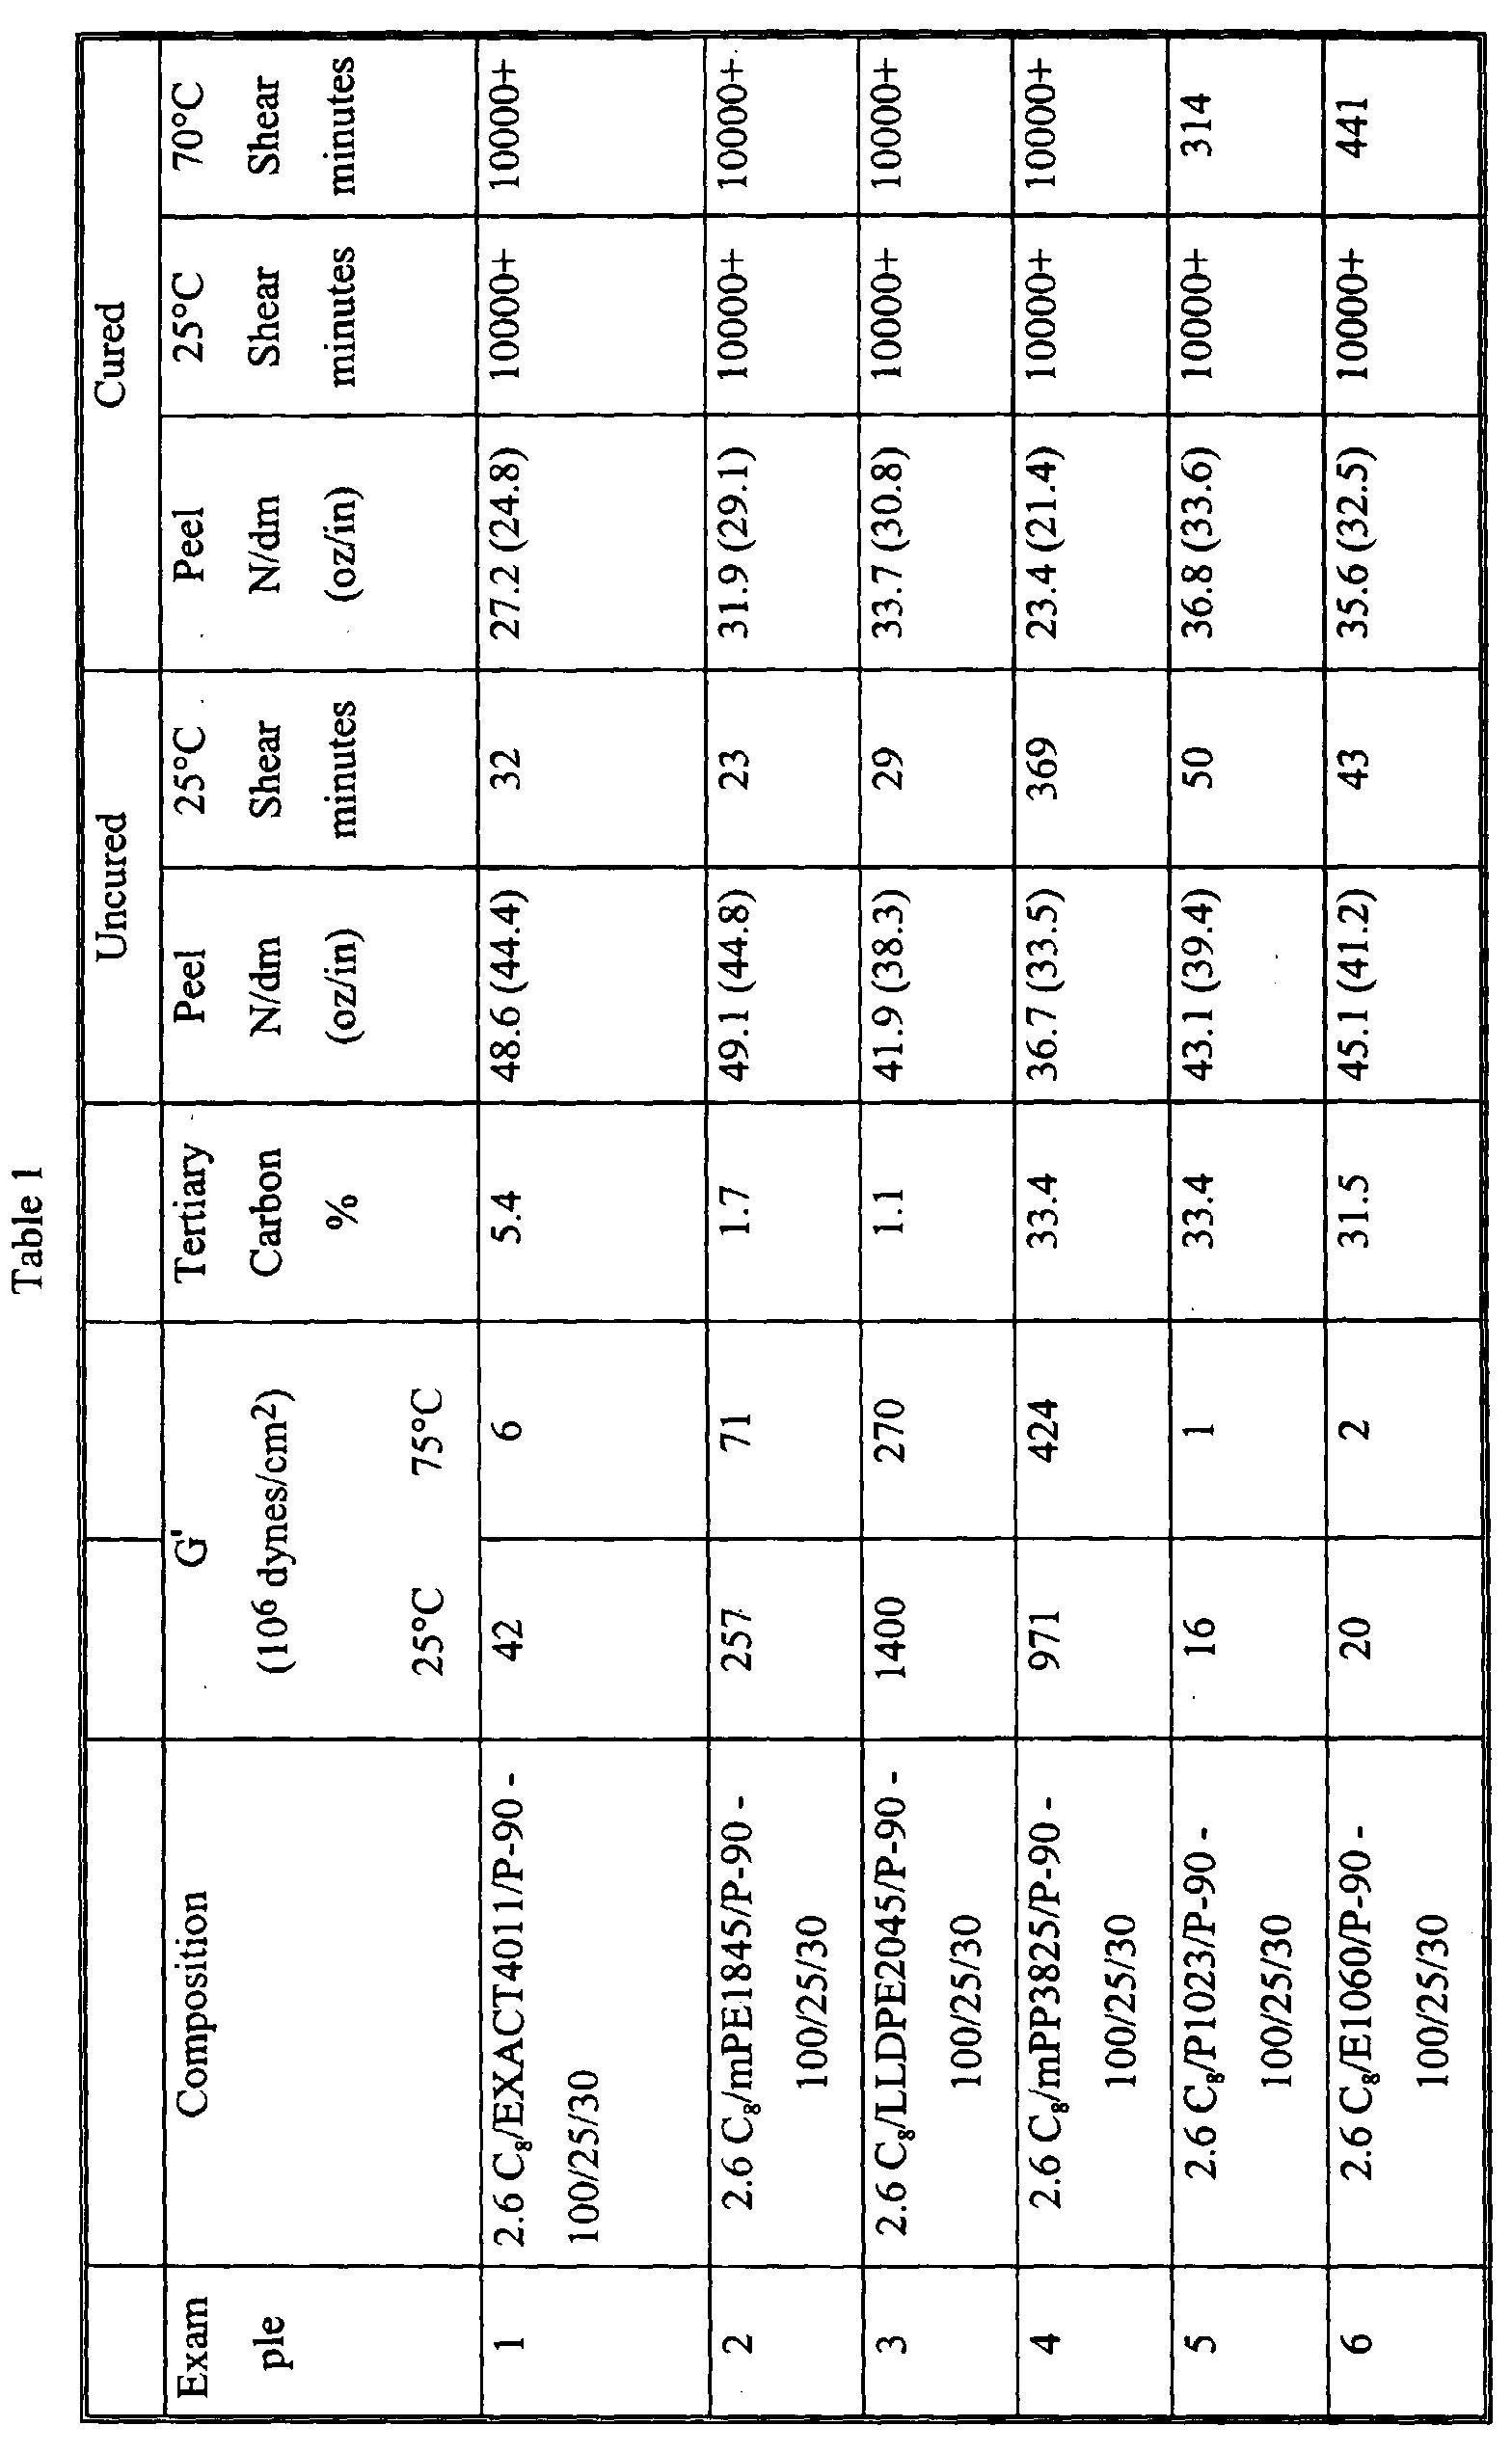 Radiation curable poly(1-alkene) based pressure-sensitive adhesives